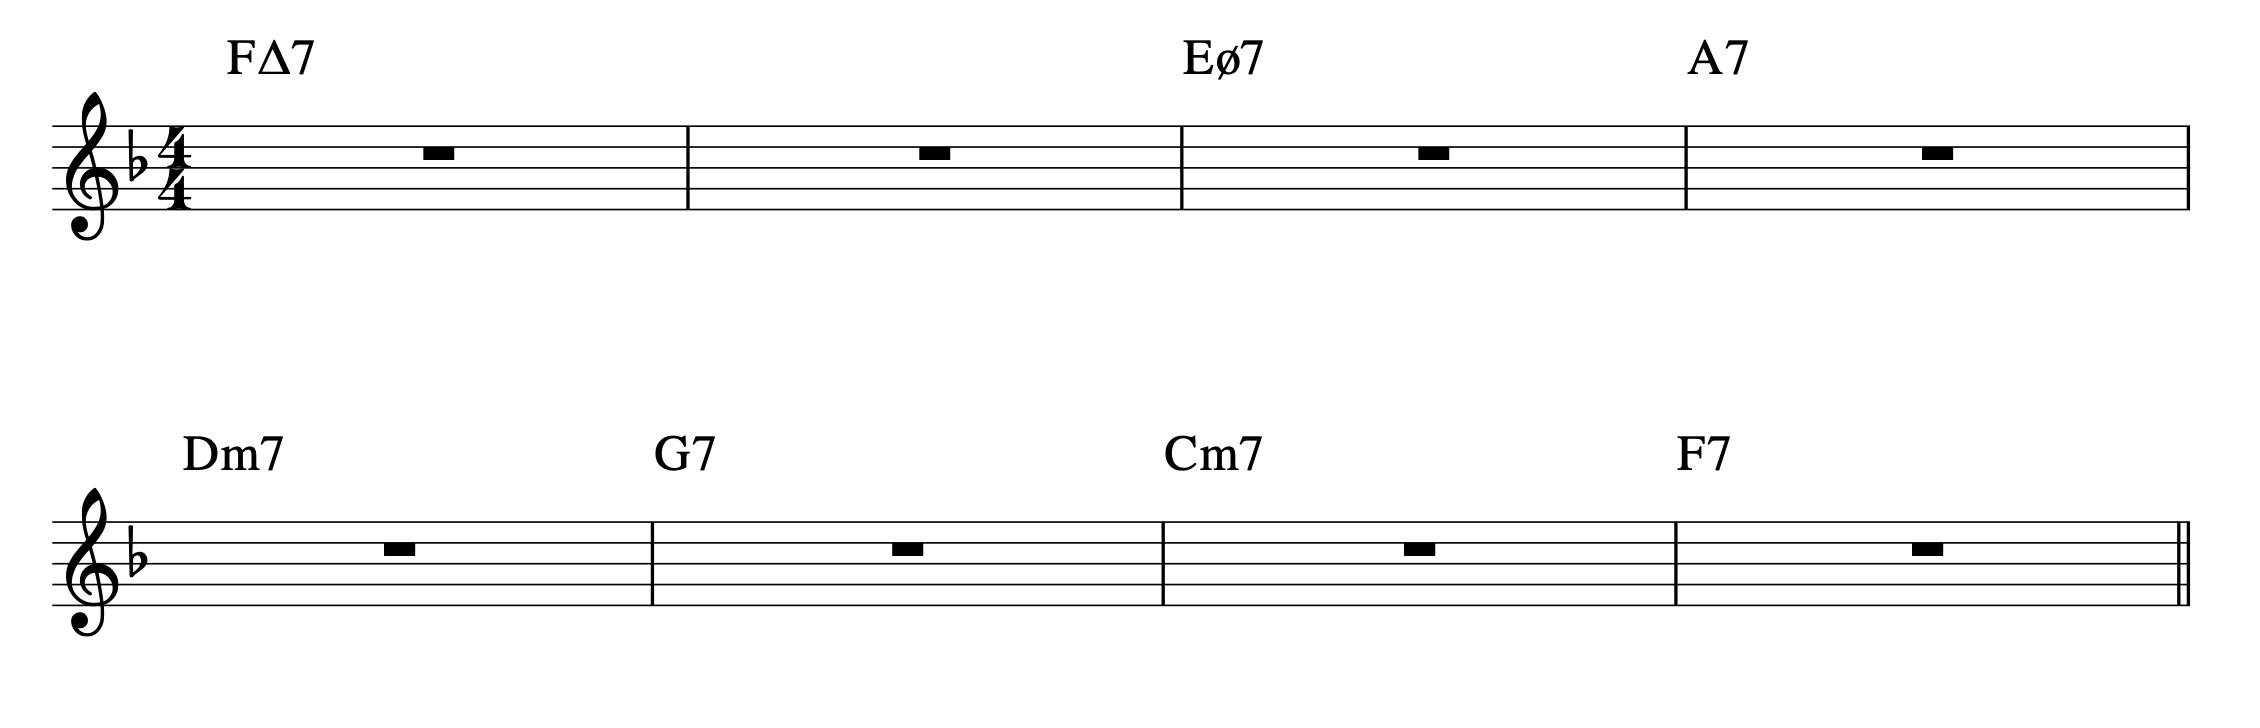 chords-tone-1